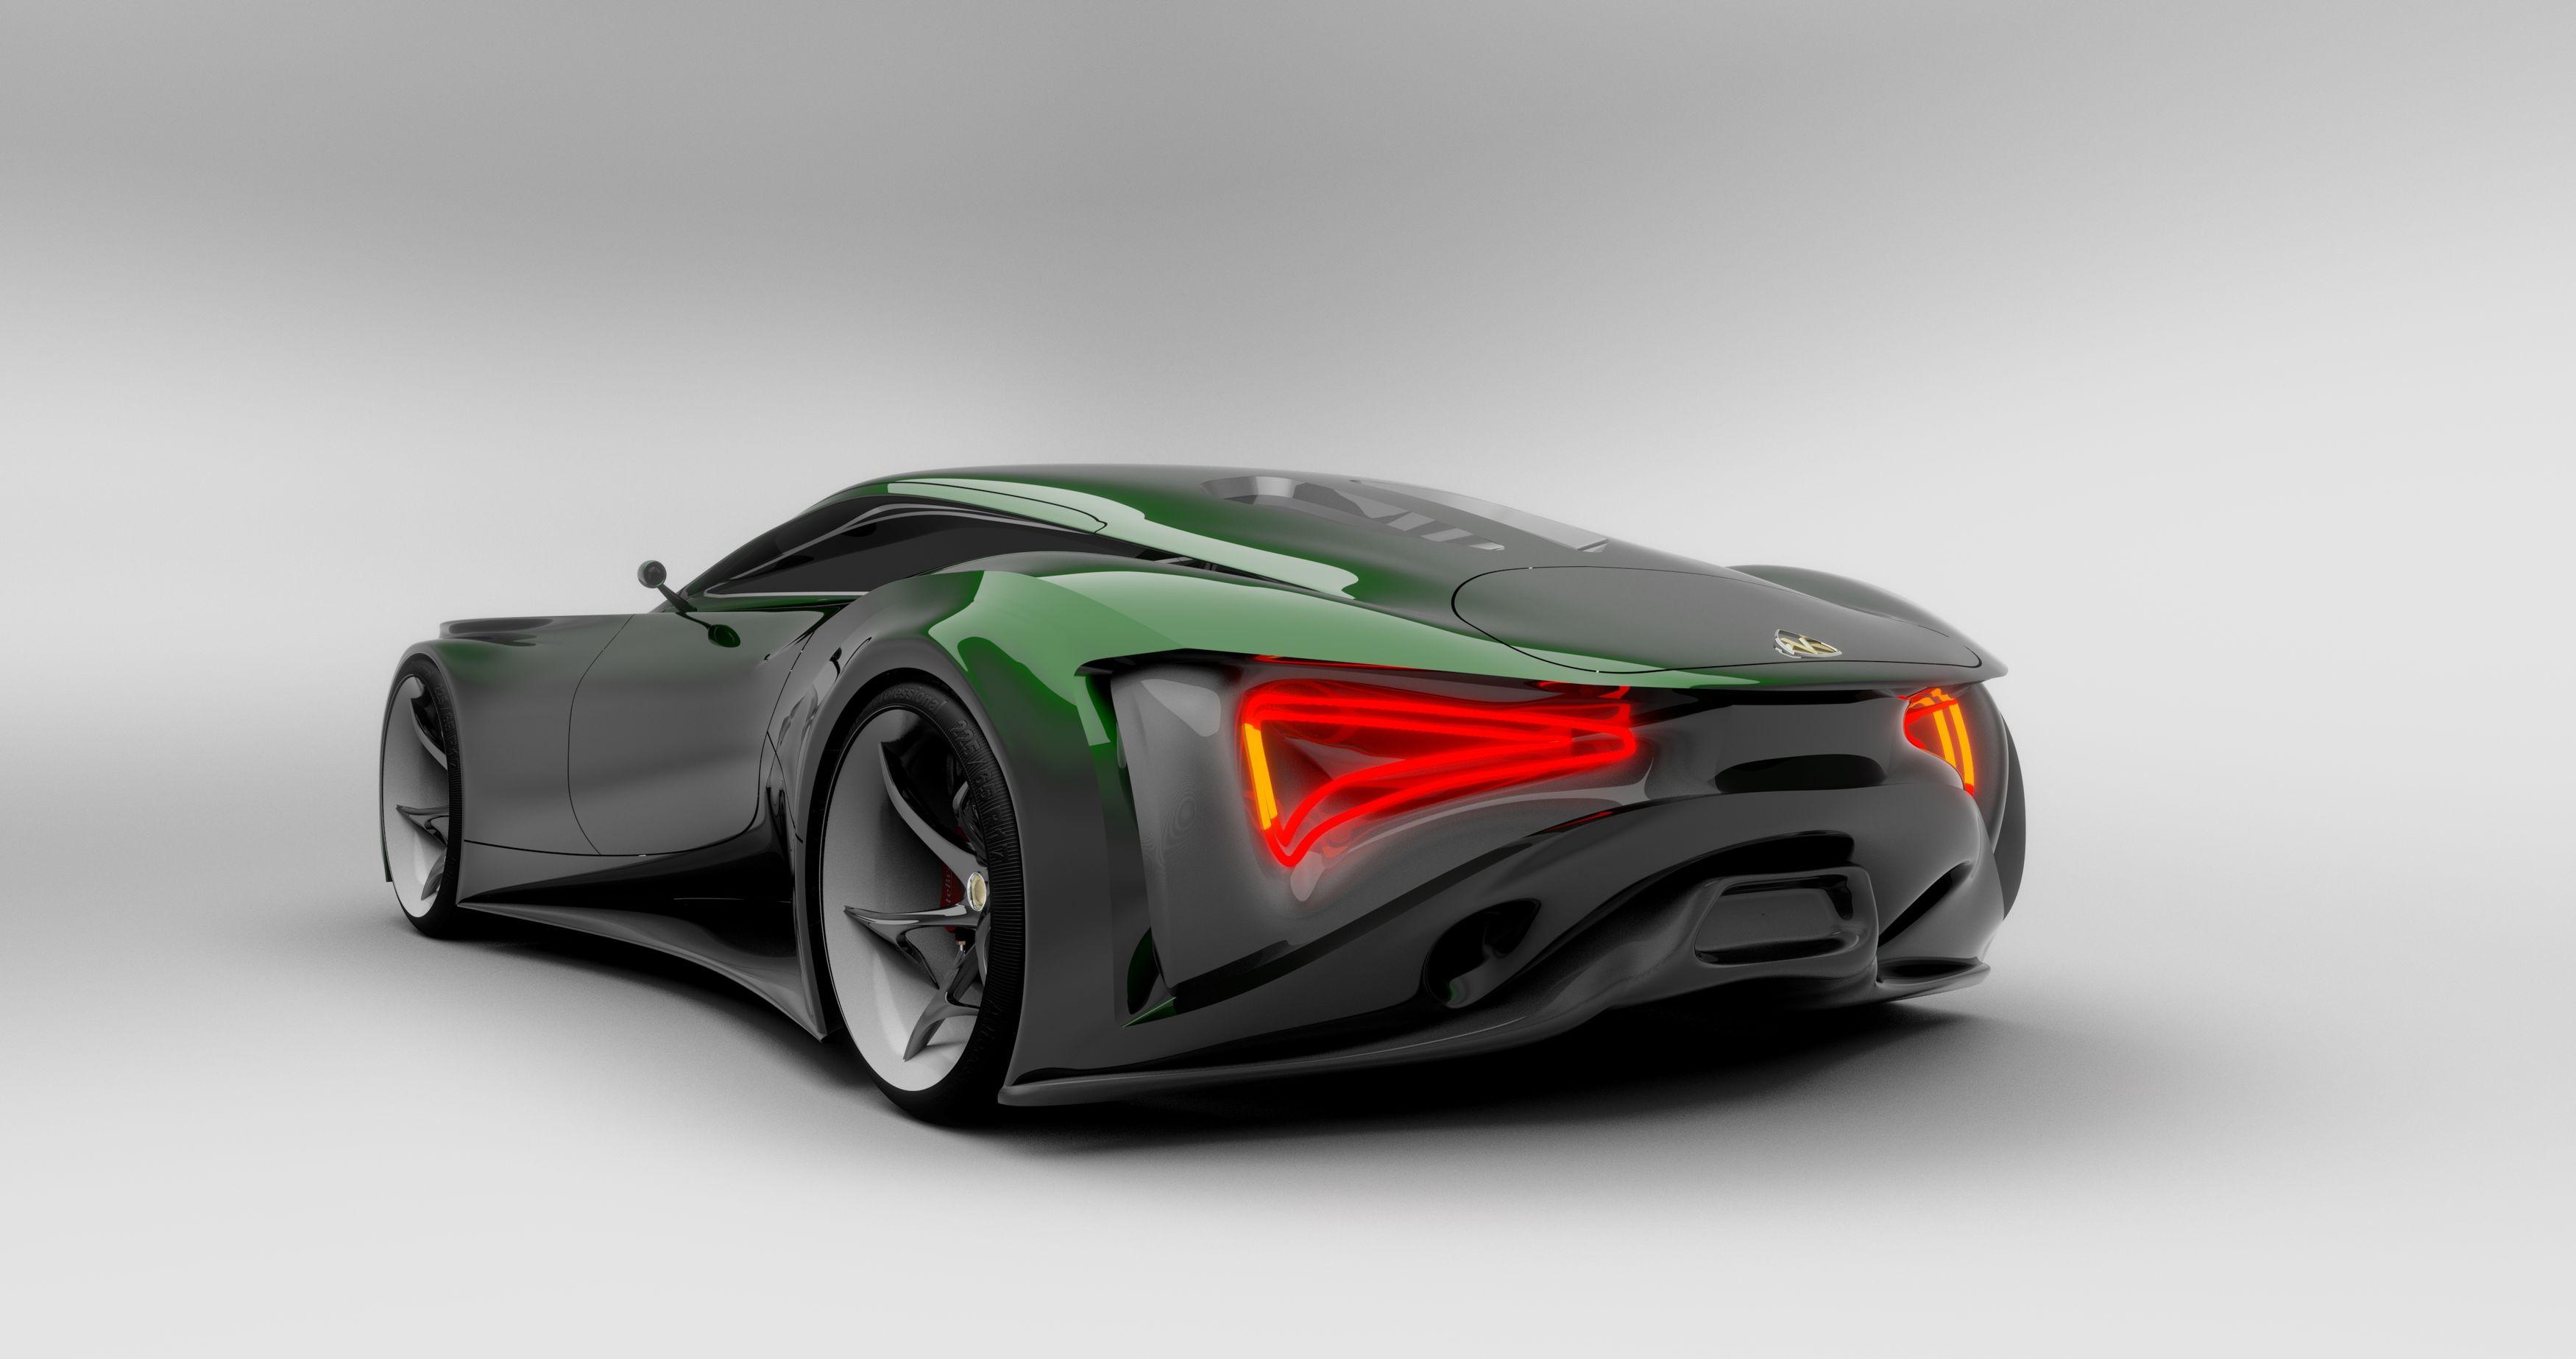 Aston-martin-db-next-x-4-3500-3500